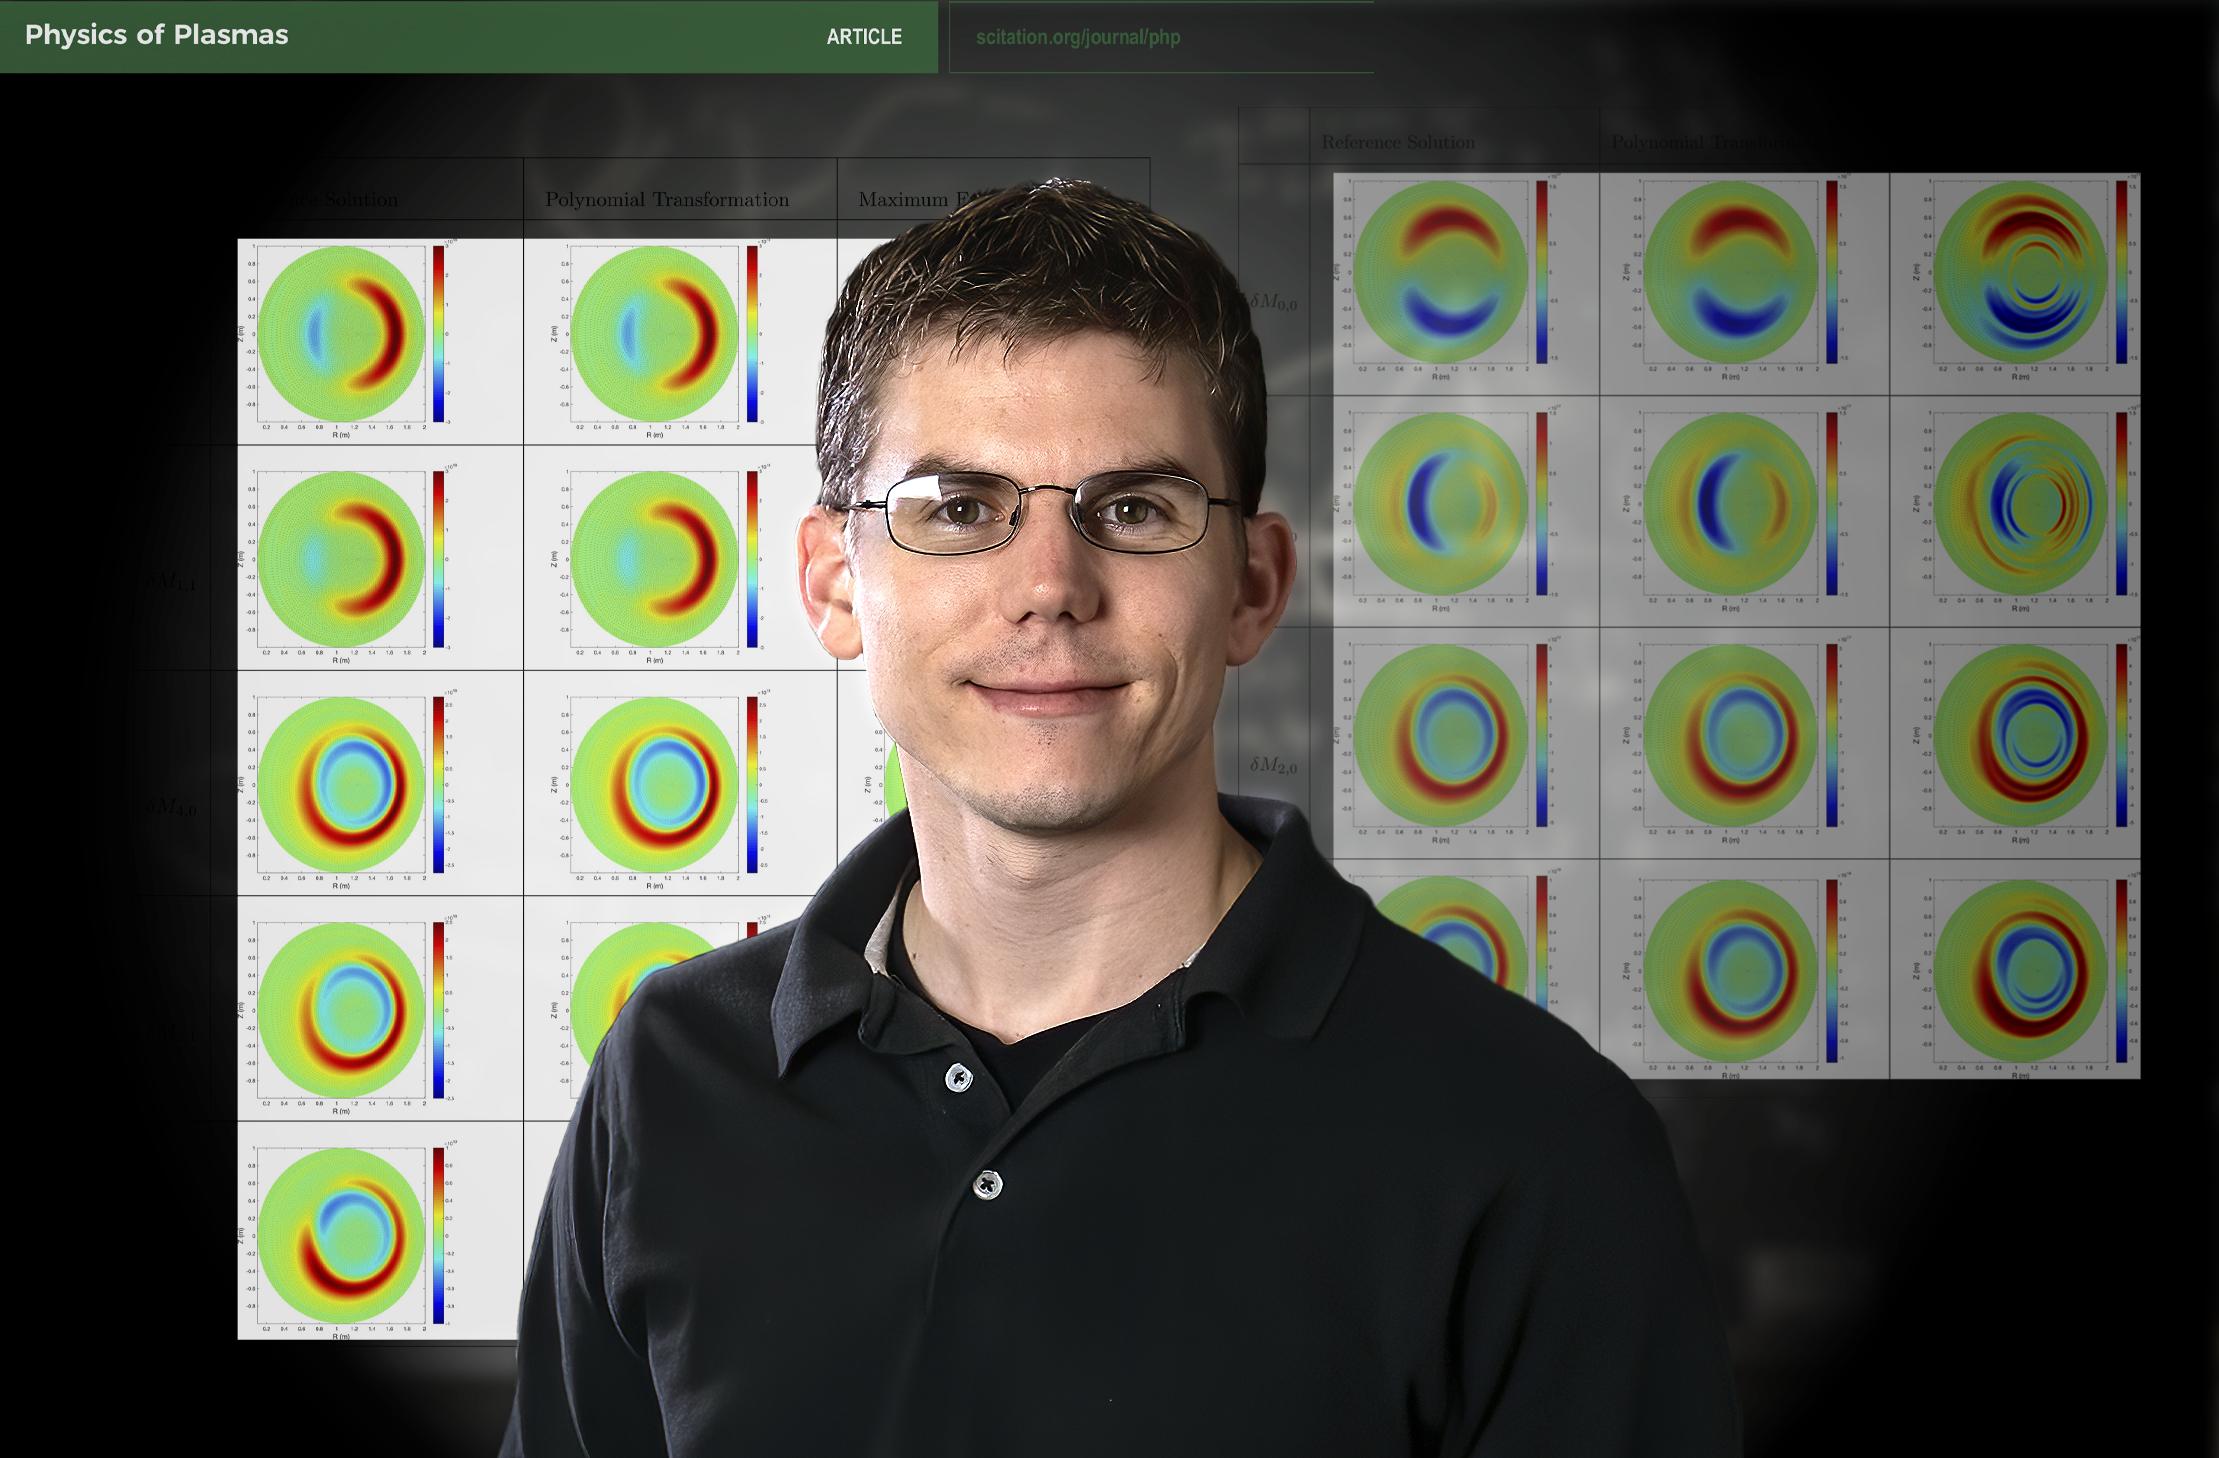 Ben Sturdevant, DOE/Princeton Plasma Physics Laboratory